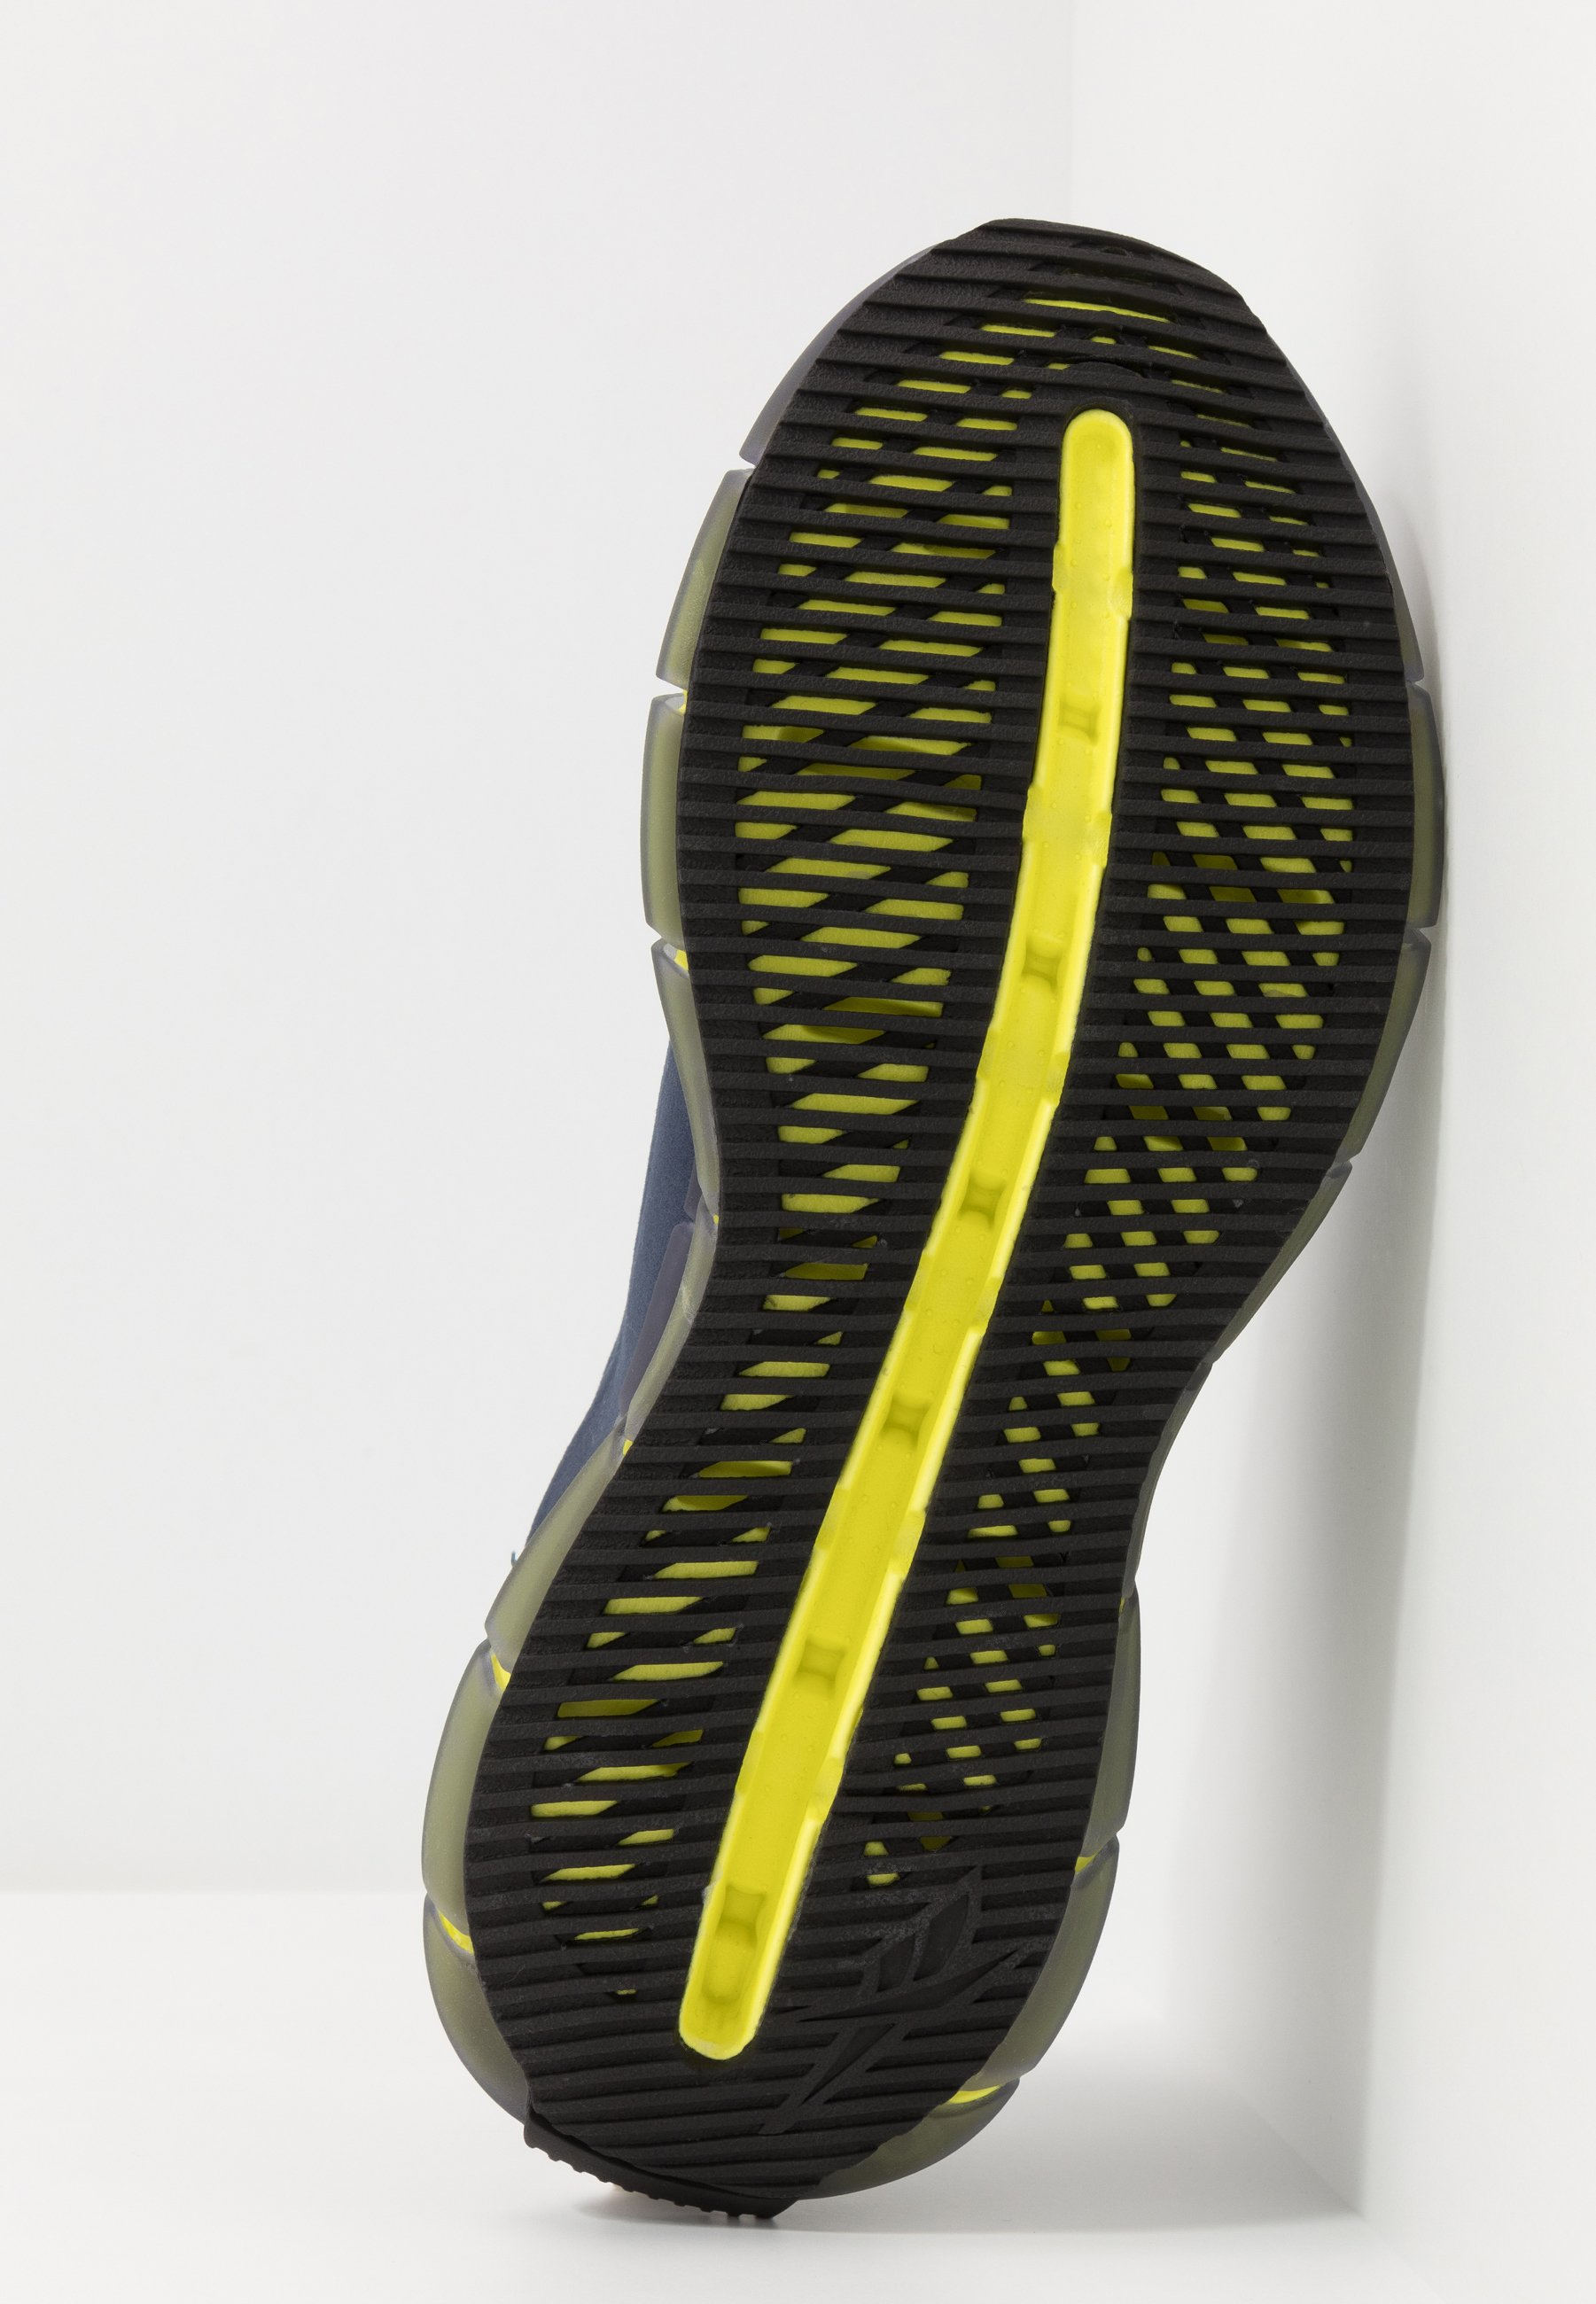 Reebok Classic Zig Kinetica Concept Type2 - Sneakers Basse Navy/hero Yellow/cold Grey 4zQ6Xxn